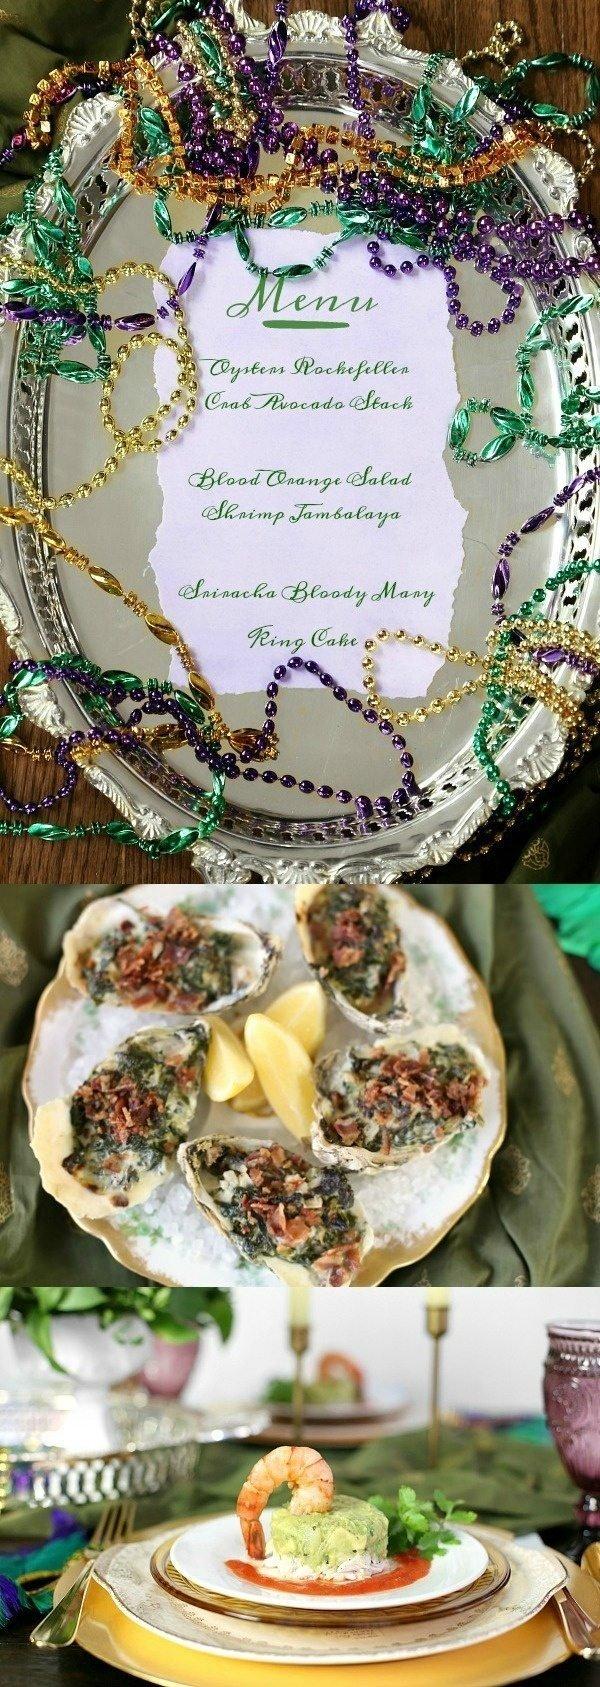 10 Stylish Mardi Gras Party Food Ideas mardi gras inspired dinner party menu recipe girl 2021